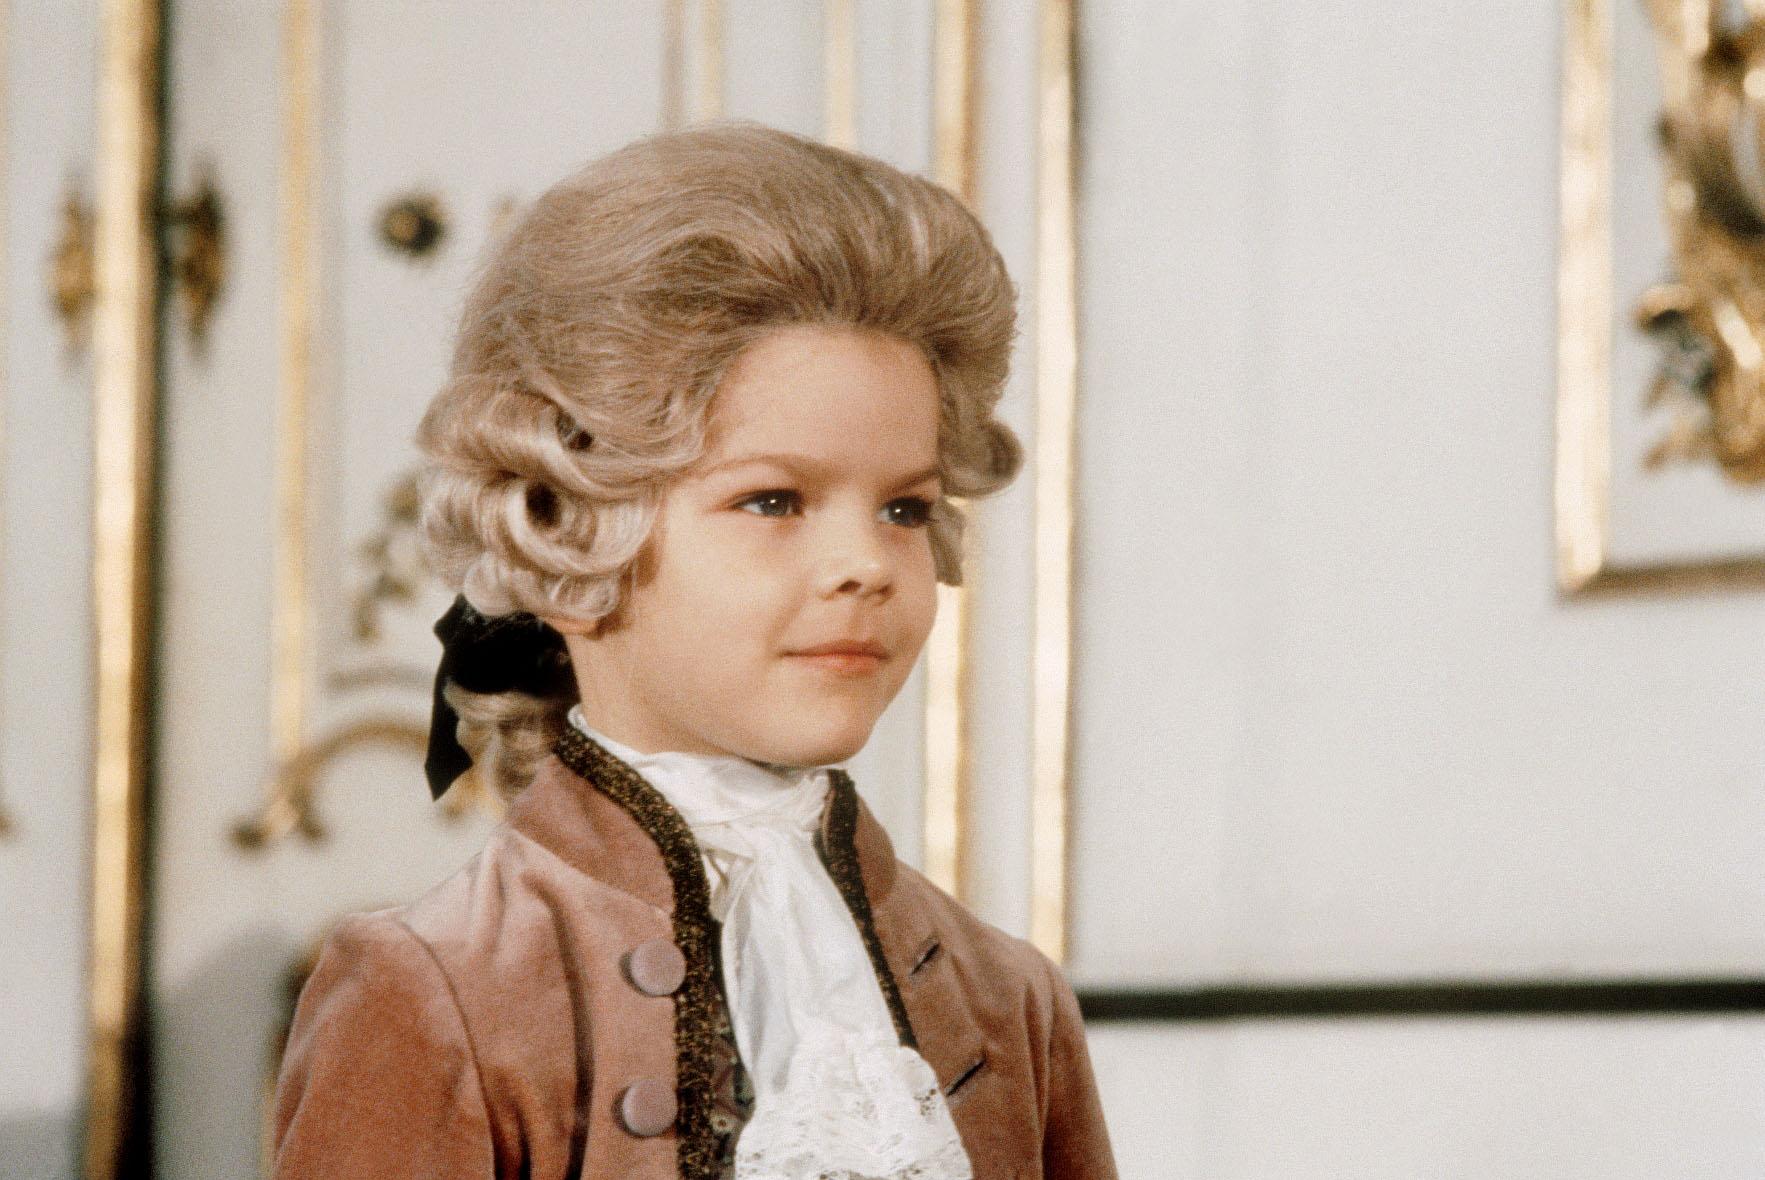 Wolfgang (A. Mozart)